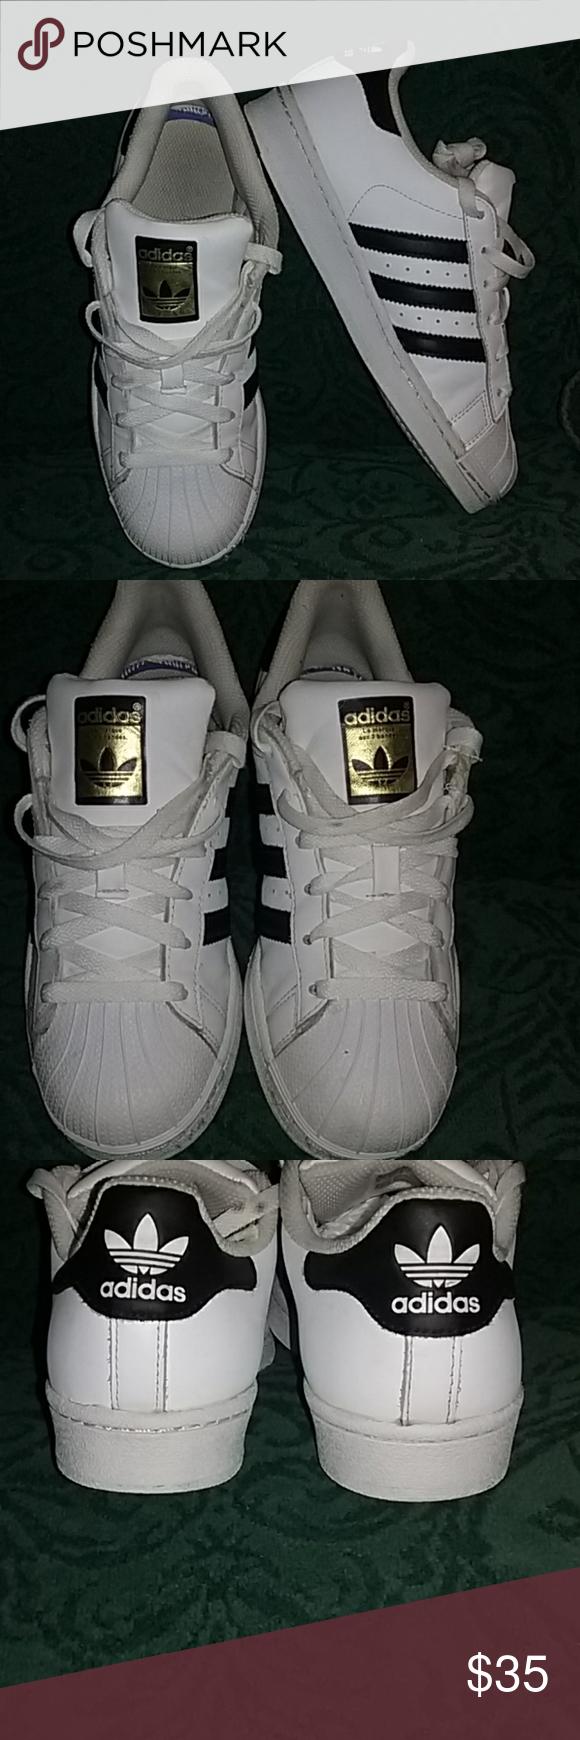 Adidas Ladies Sneakers White LEATHER/Black stripes, EXCELLENT ...